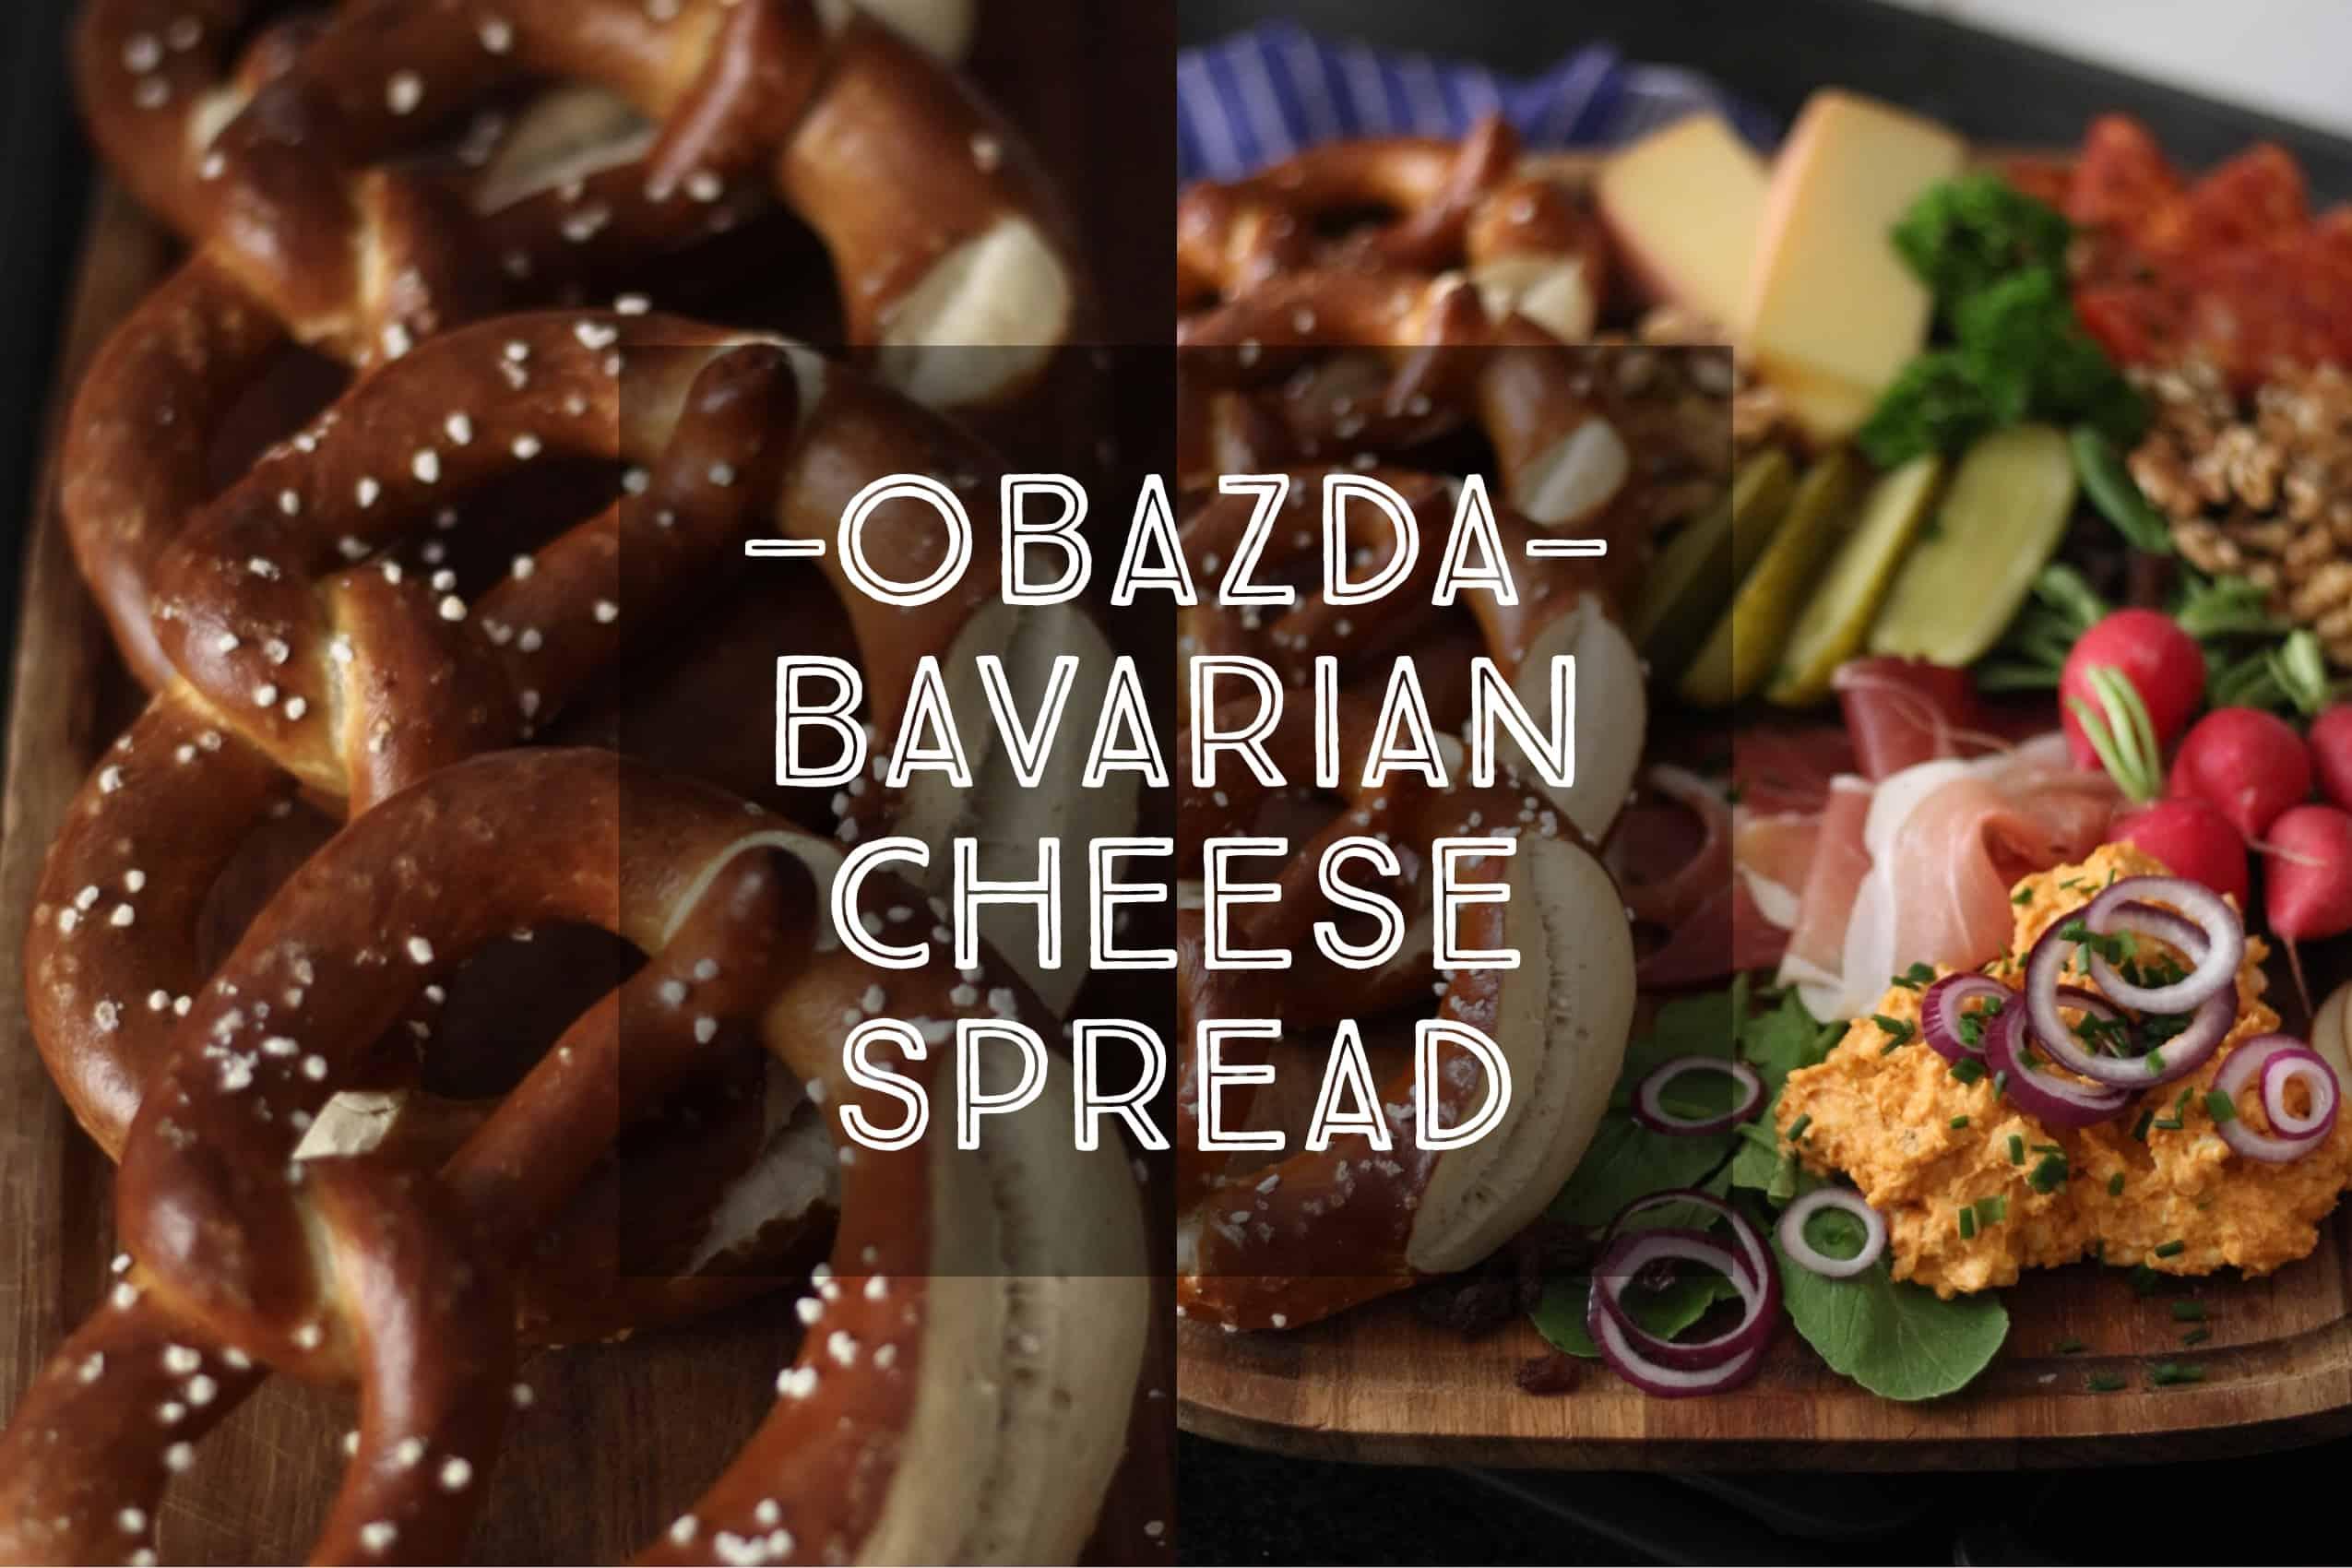 obazda bavarian cheese spread